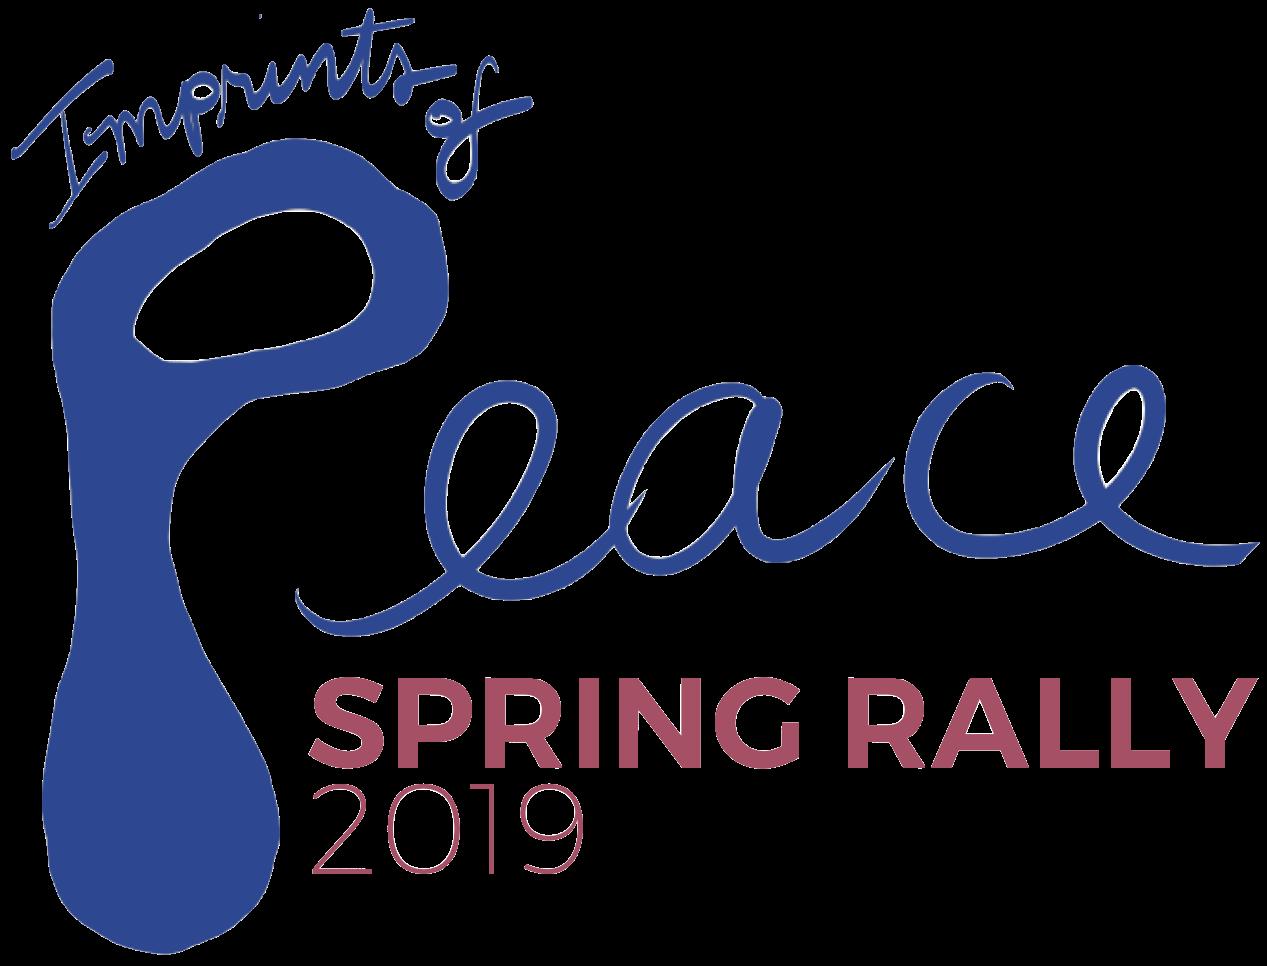 Spring Rally 2019 Logo-2.png